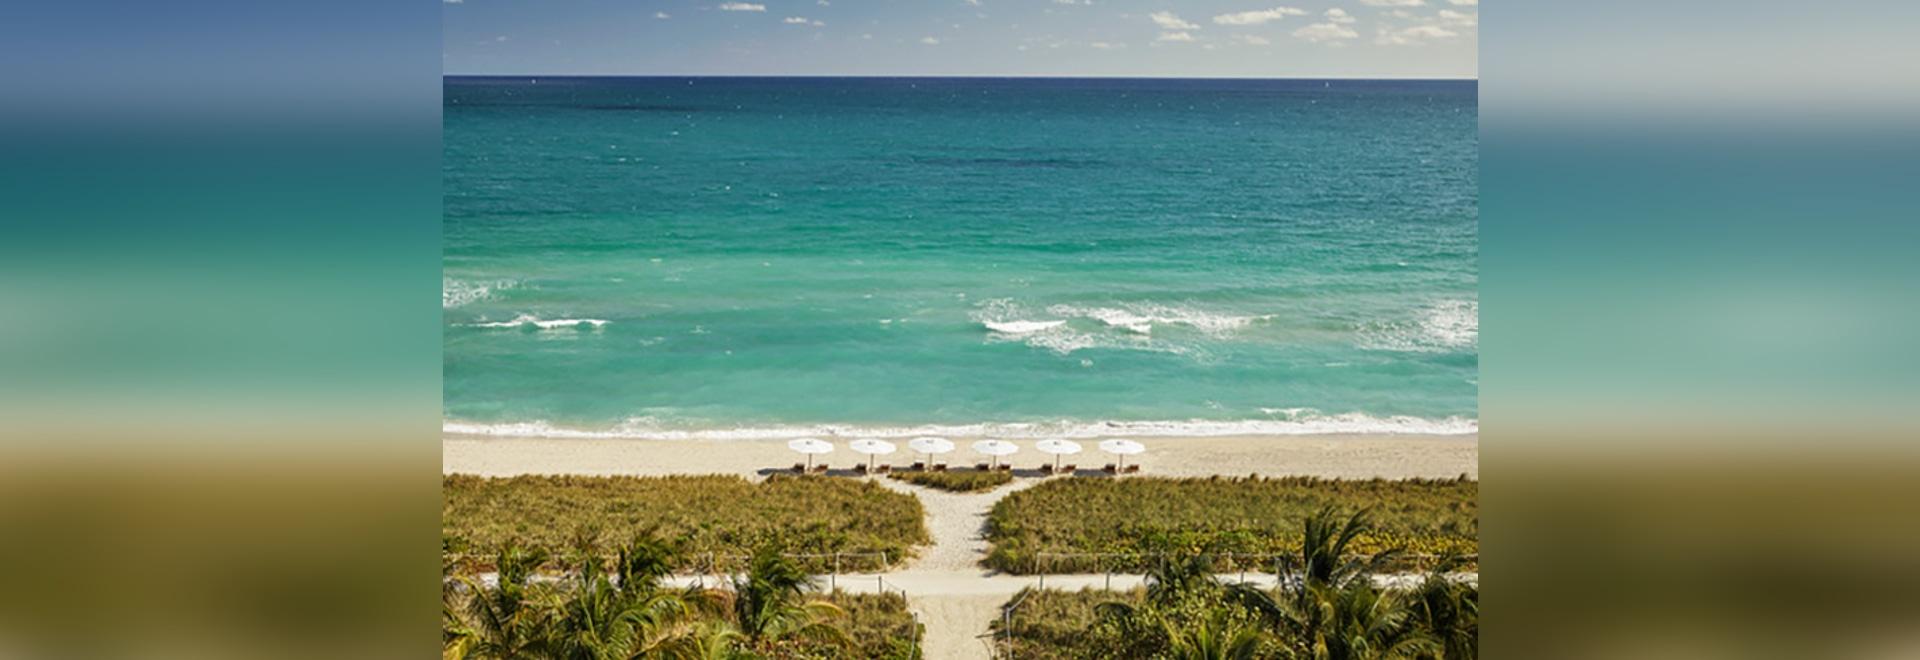 FOUR SEASONS HOTEL THE SURF CLUB